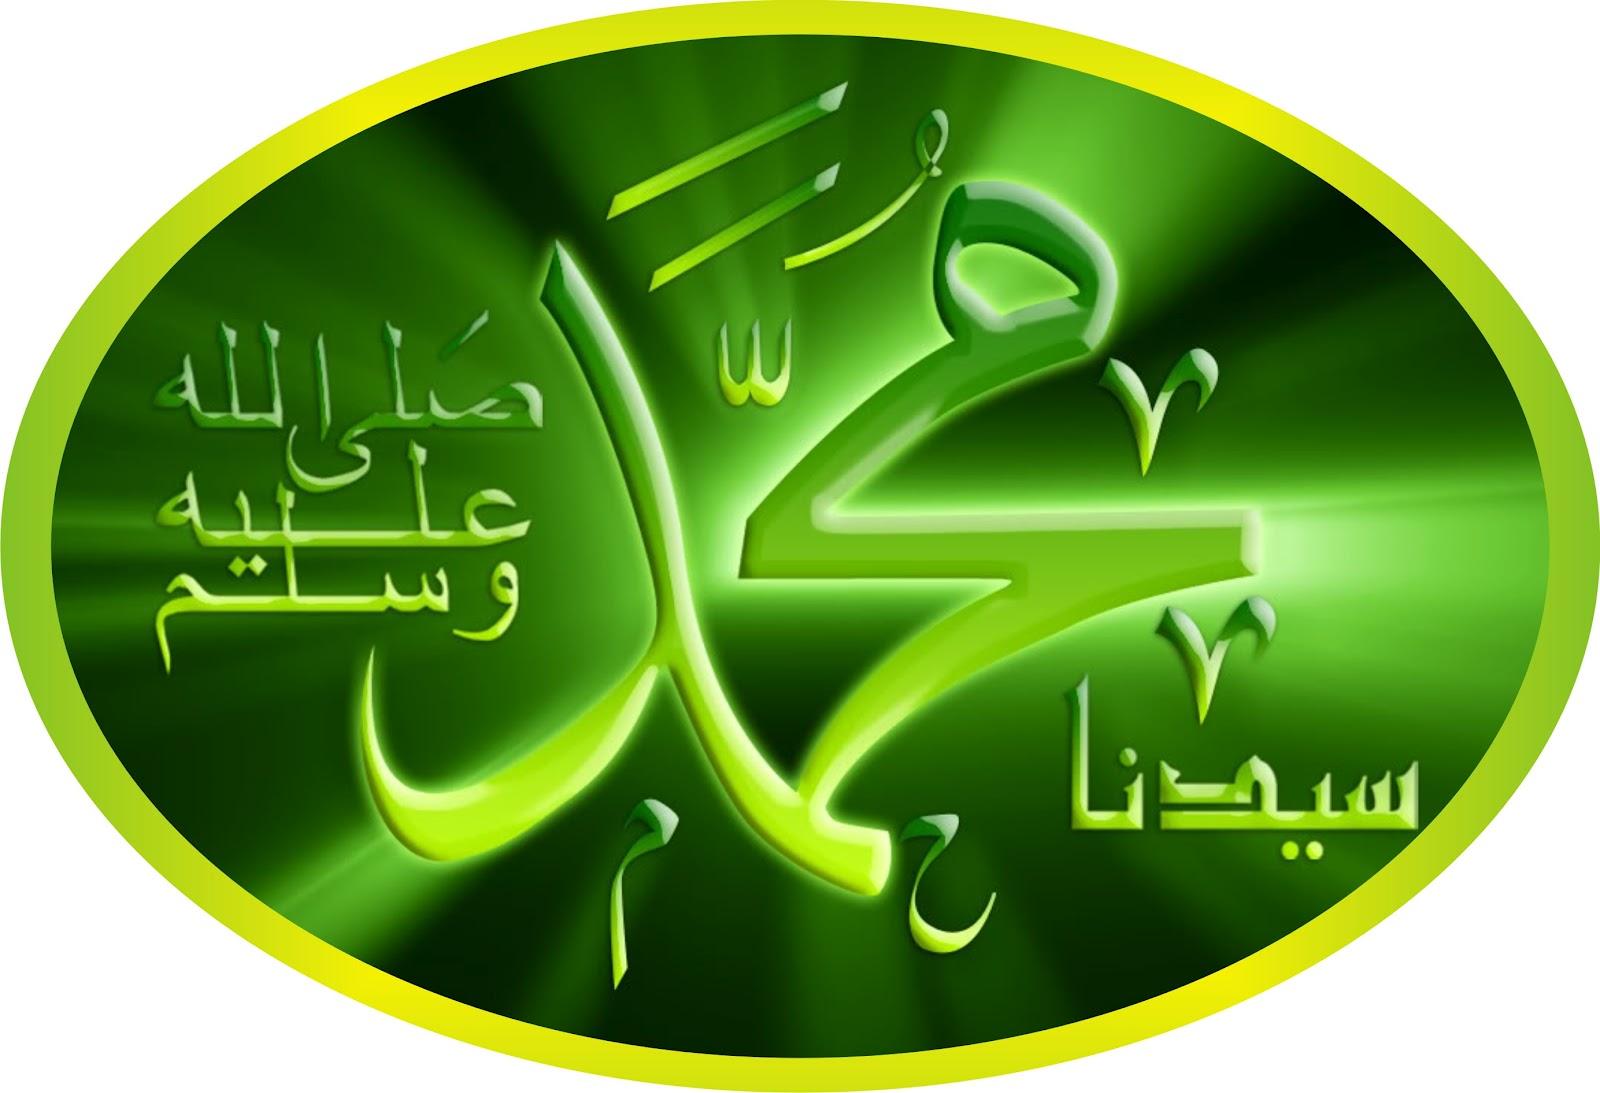 Contoh Biografi Nabi Muhammad Saw - Hontoh